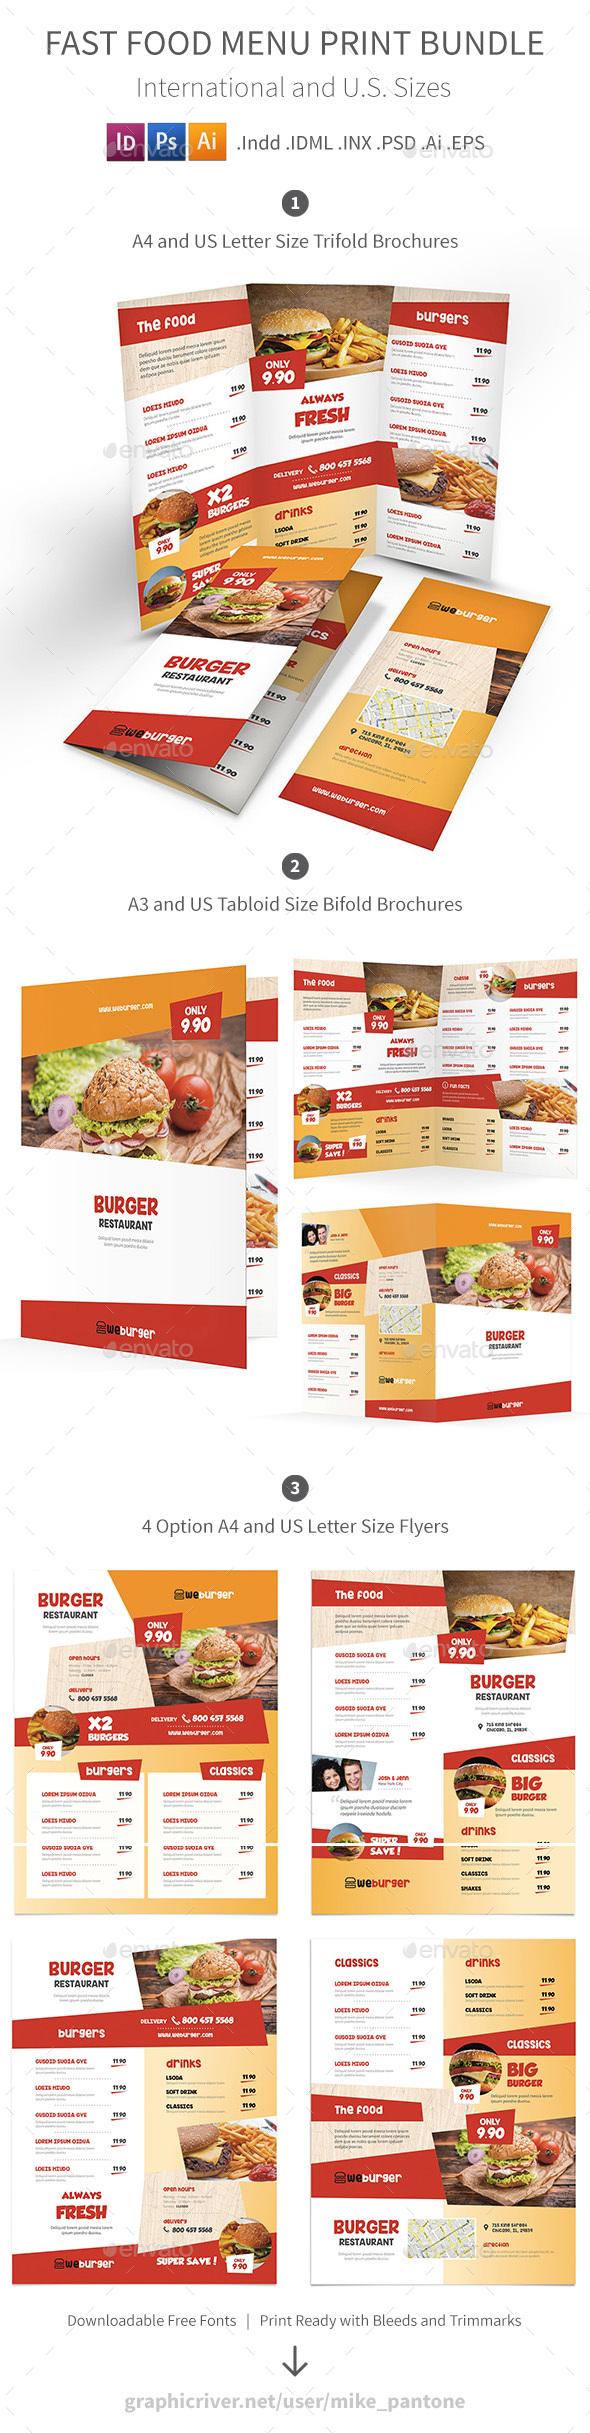 Fast Food Restaurant Menu Print Bundle - Food Menus Print Templates